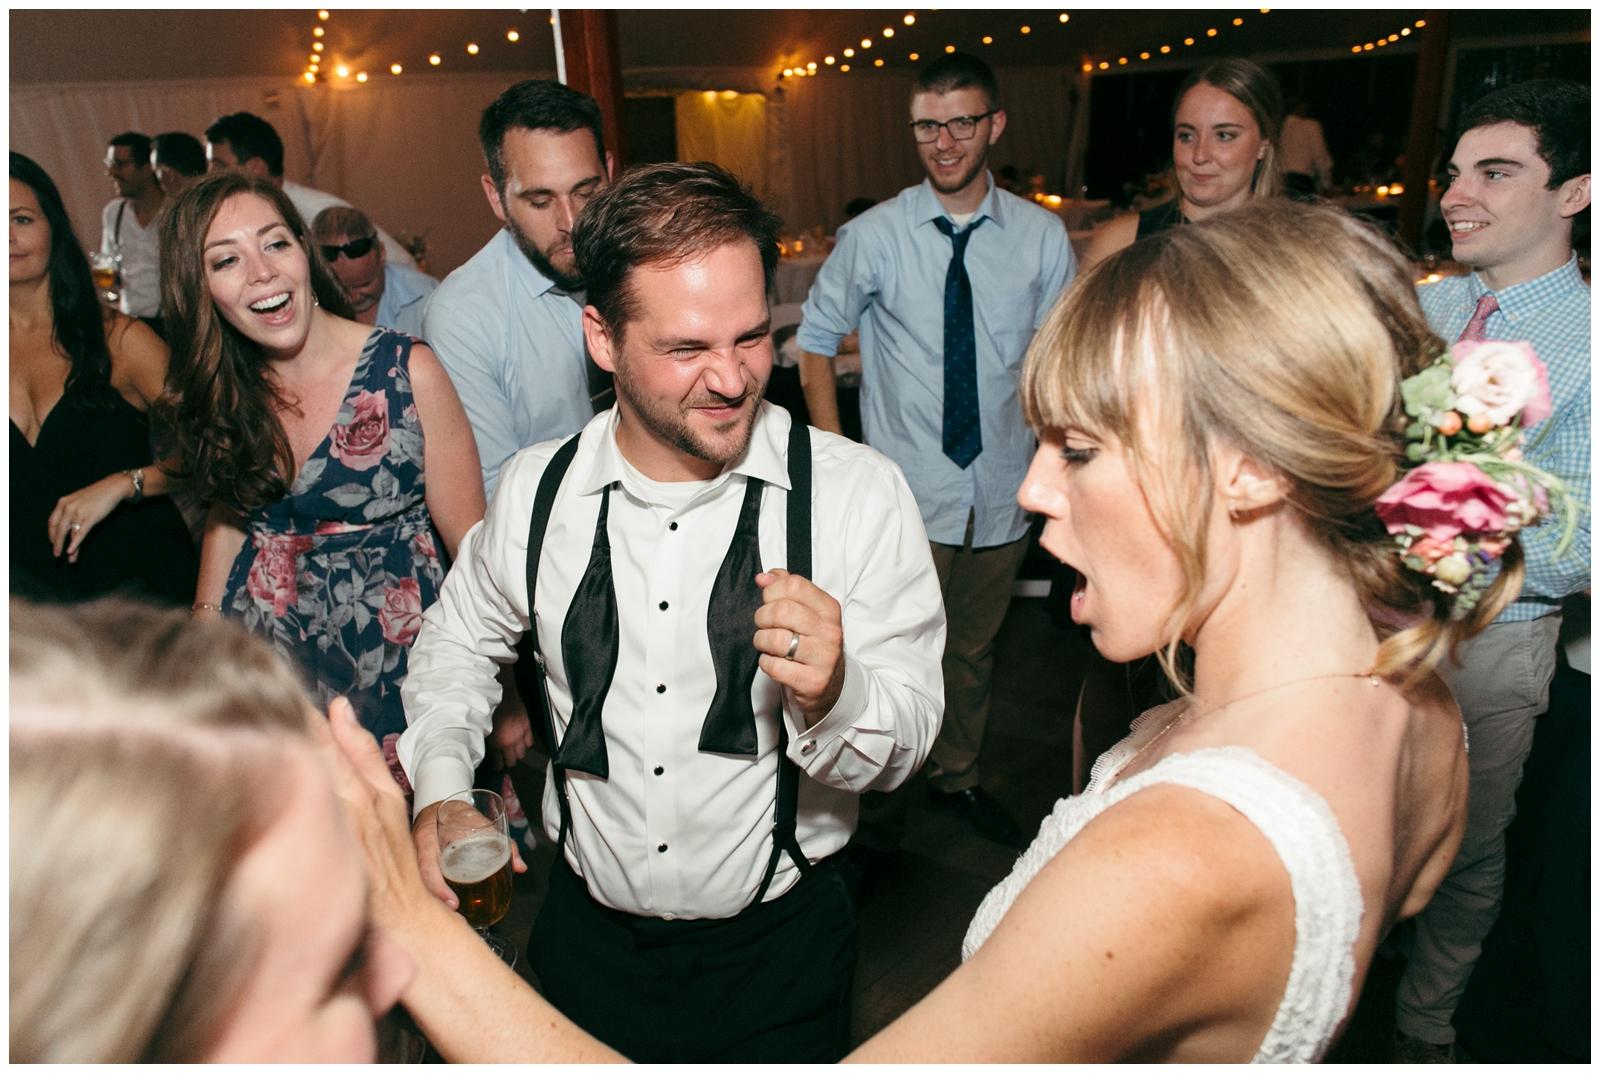 Moraine-Farm-wedding-Bailey-Q-Photo-Massachusetts-wedding-photpgrapher-176.jpg